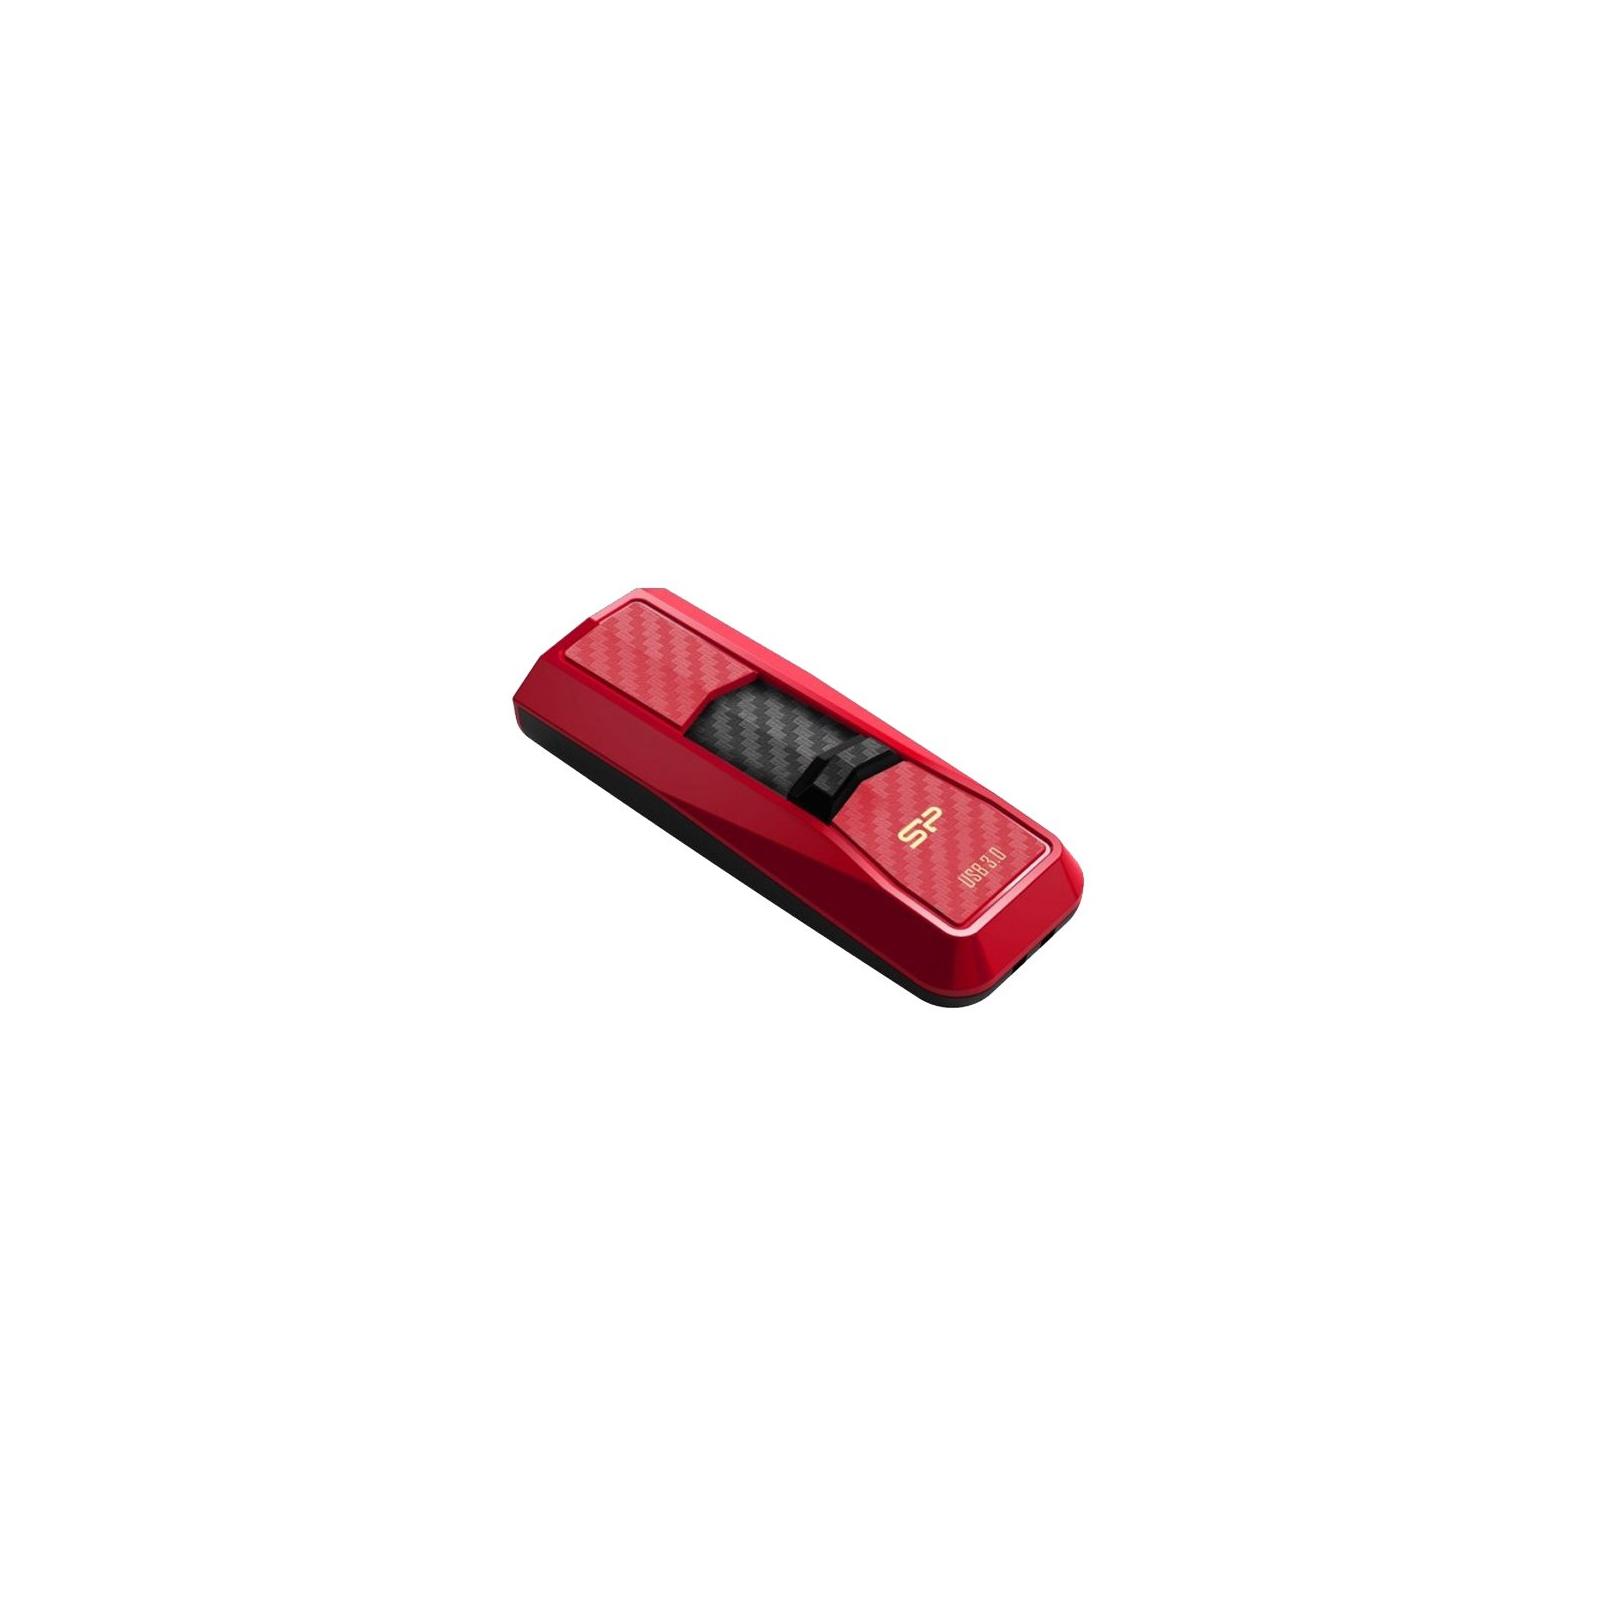 USB флеш накопитель Silicon Power 8GB B50 Black USB 3.0 (SP008GBUF3B50V1K) изображение 3